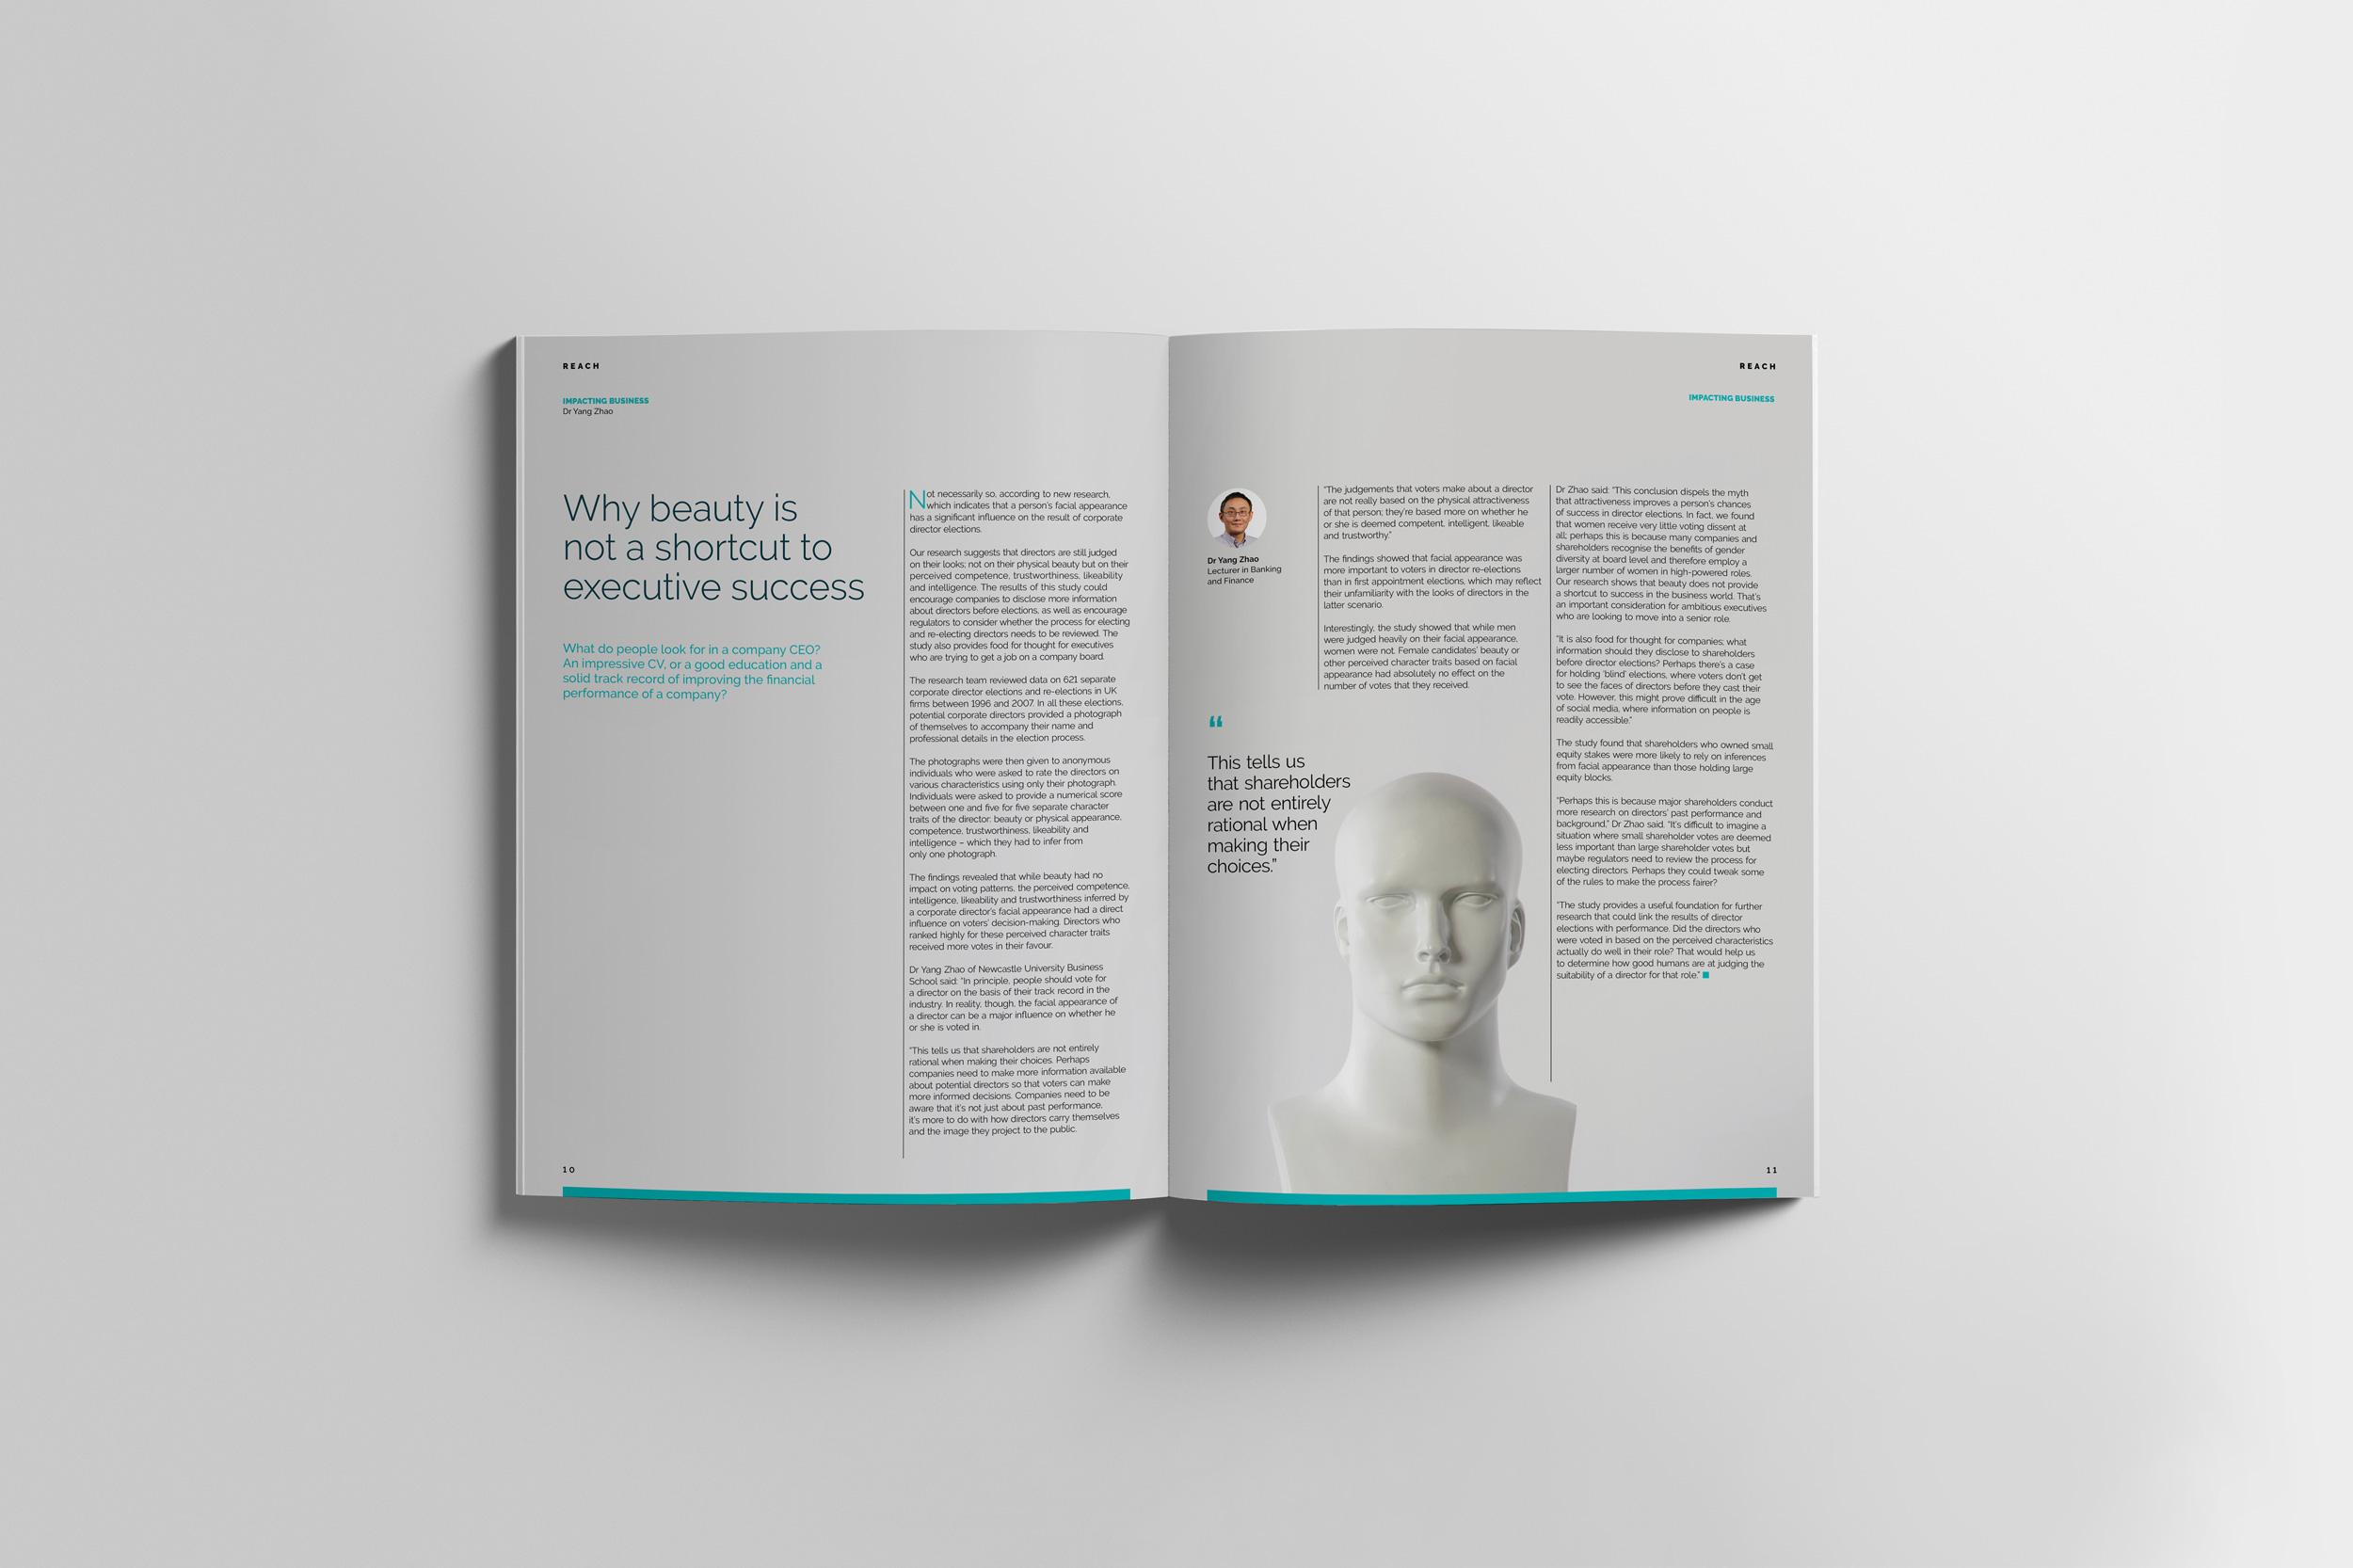 Newcastle University Business School Alumni magazine design and editorial design by Altogether Creative.